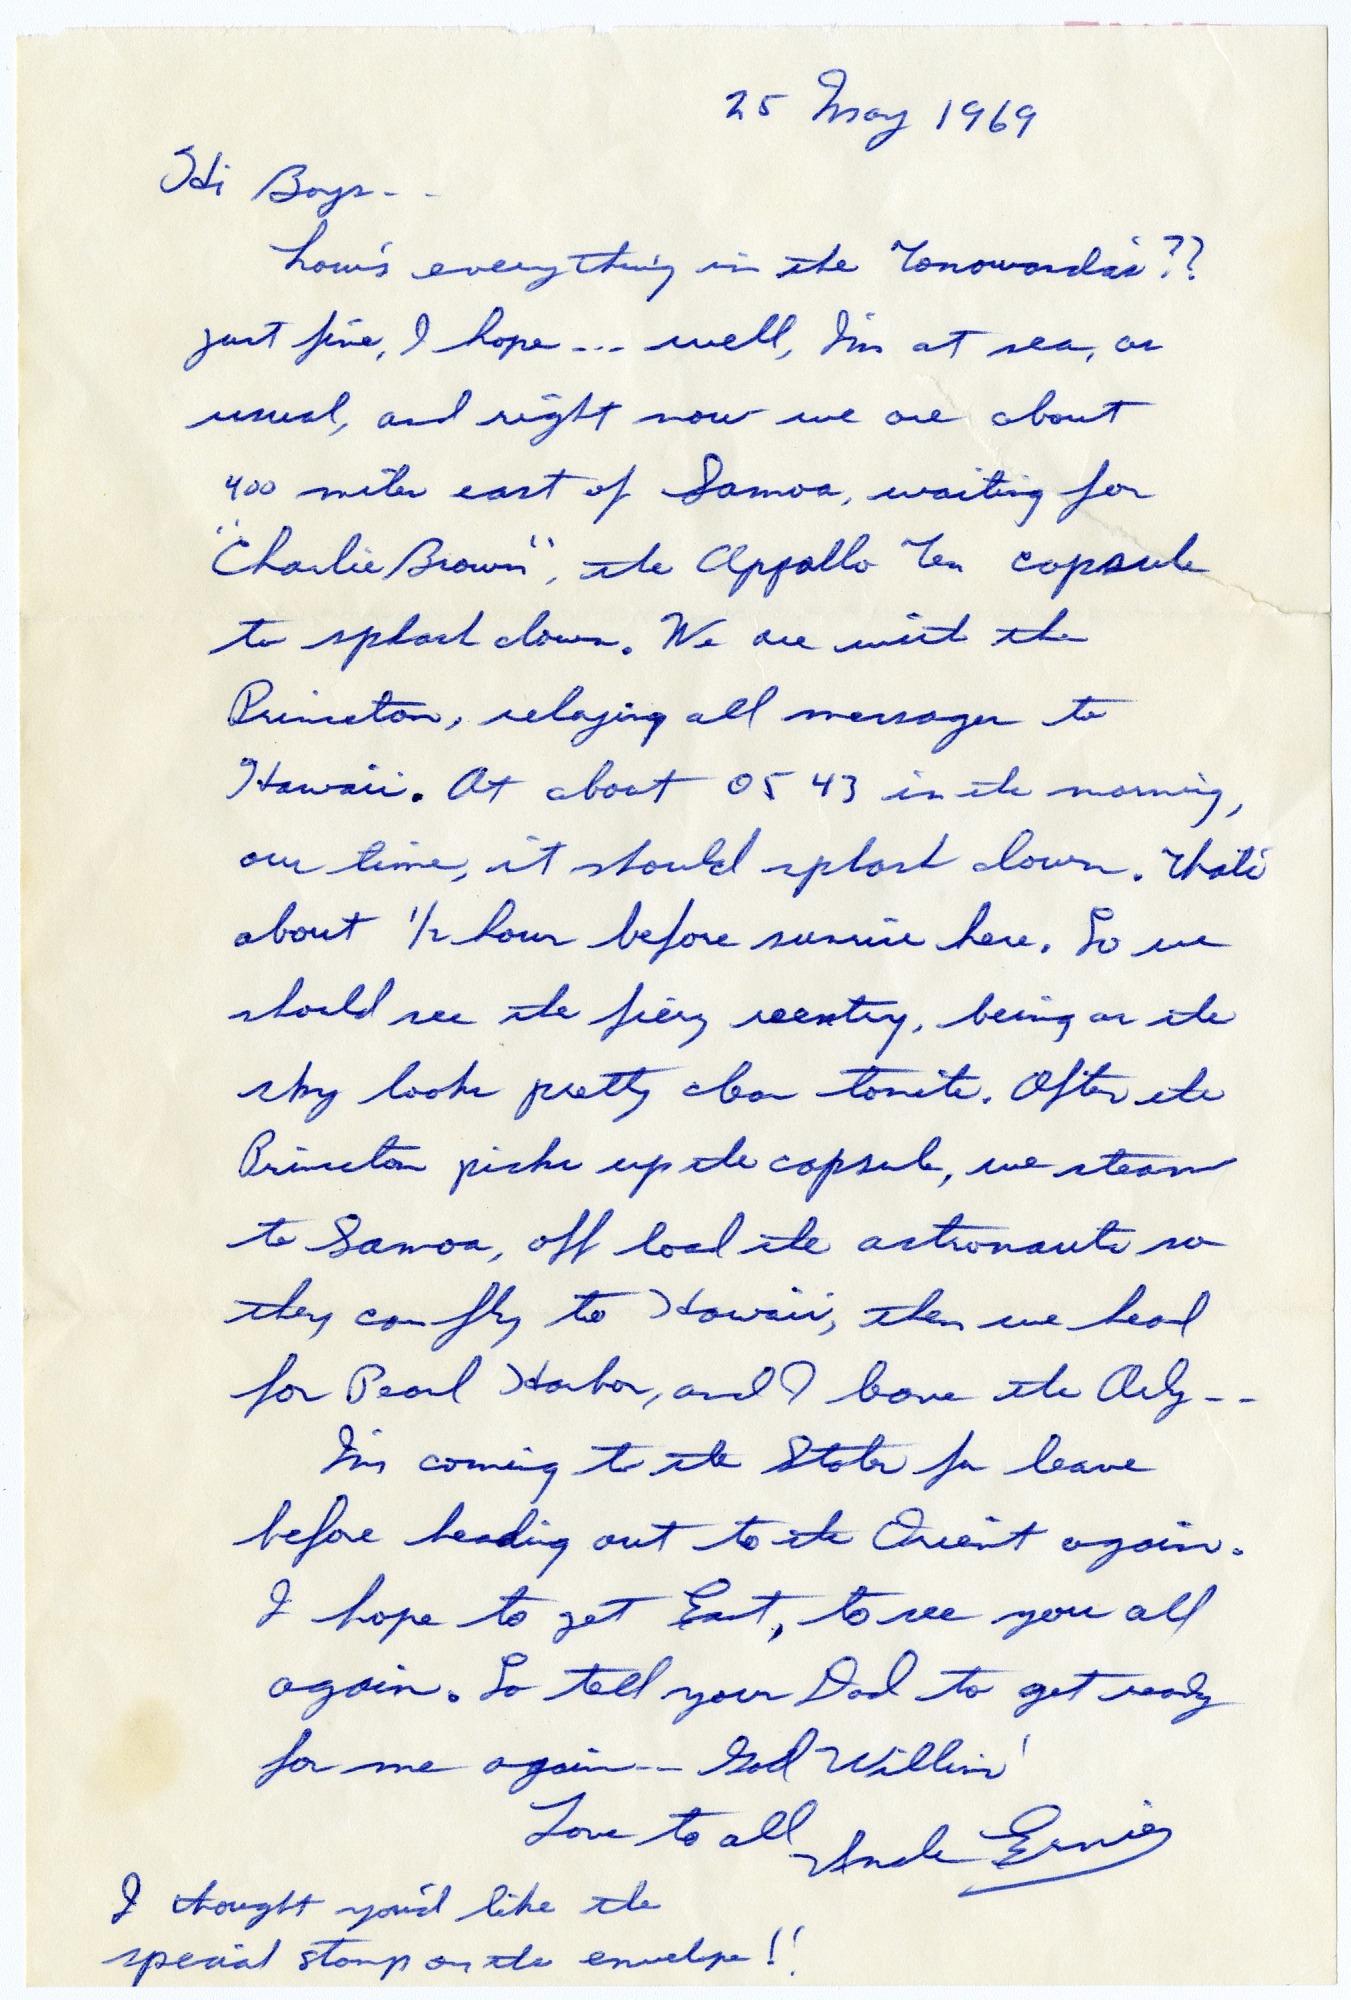 Apollo 10 Flight Recovery Letter Fearn